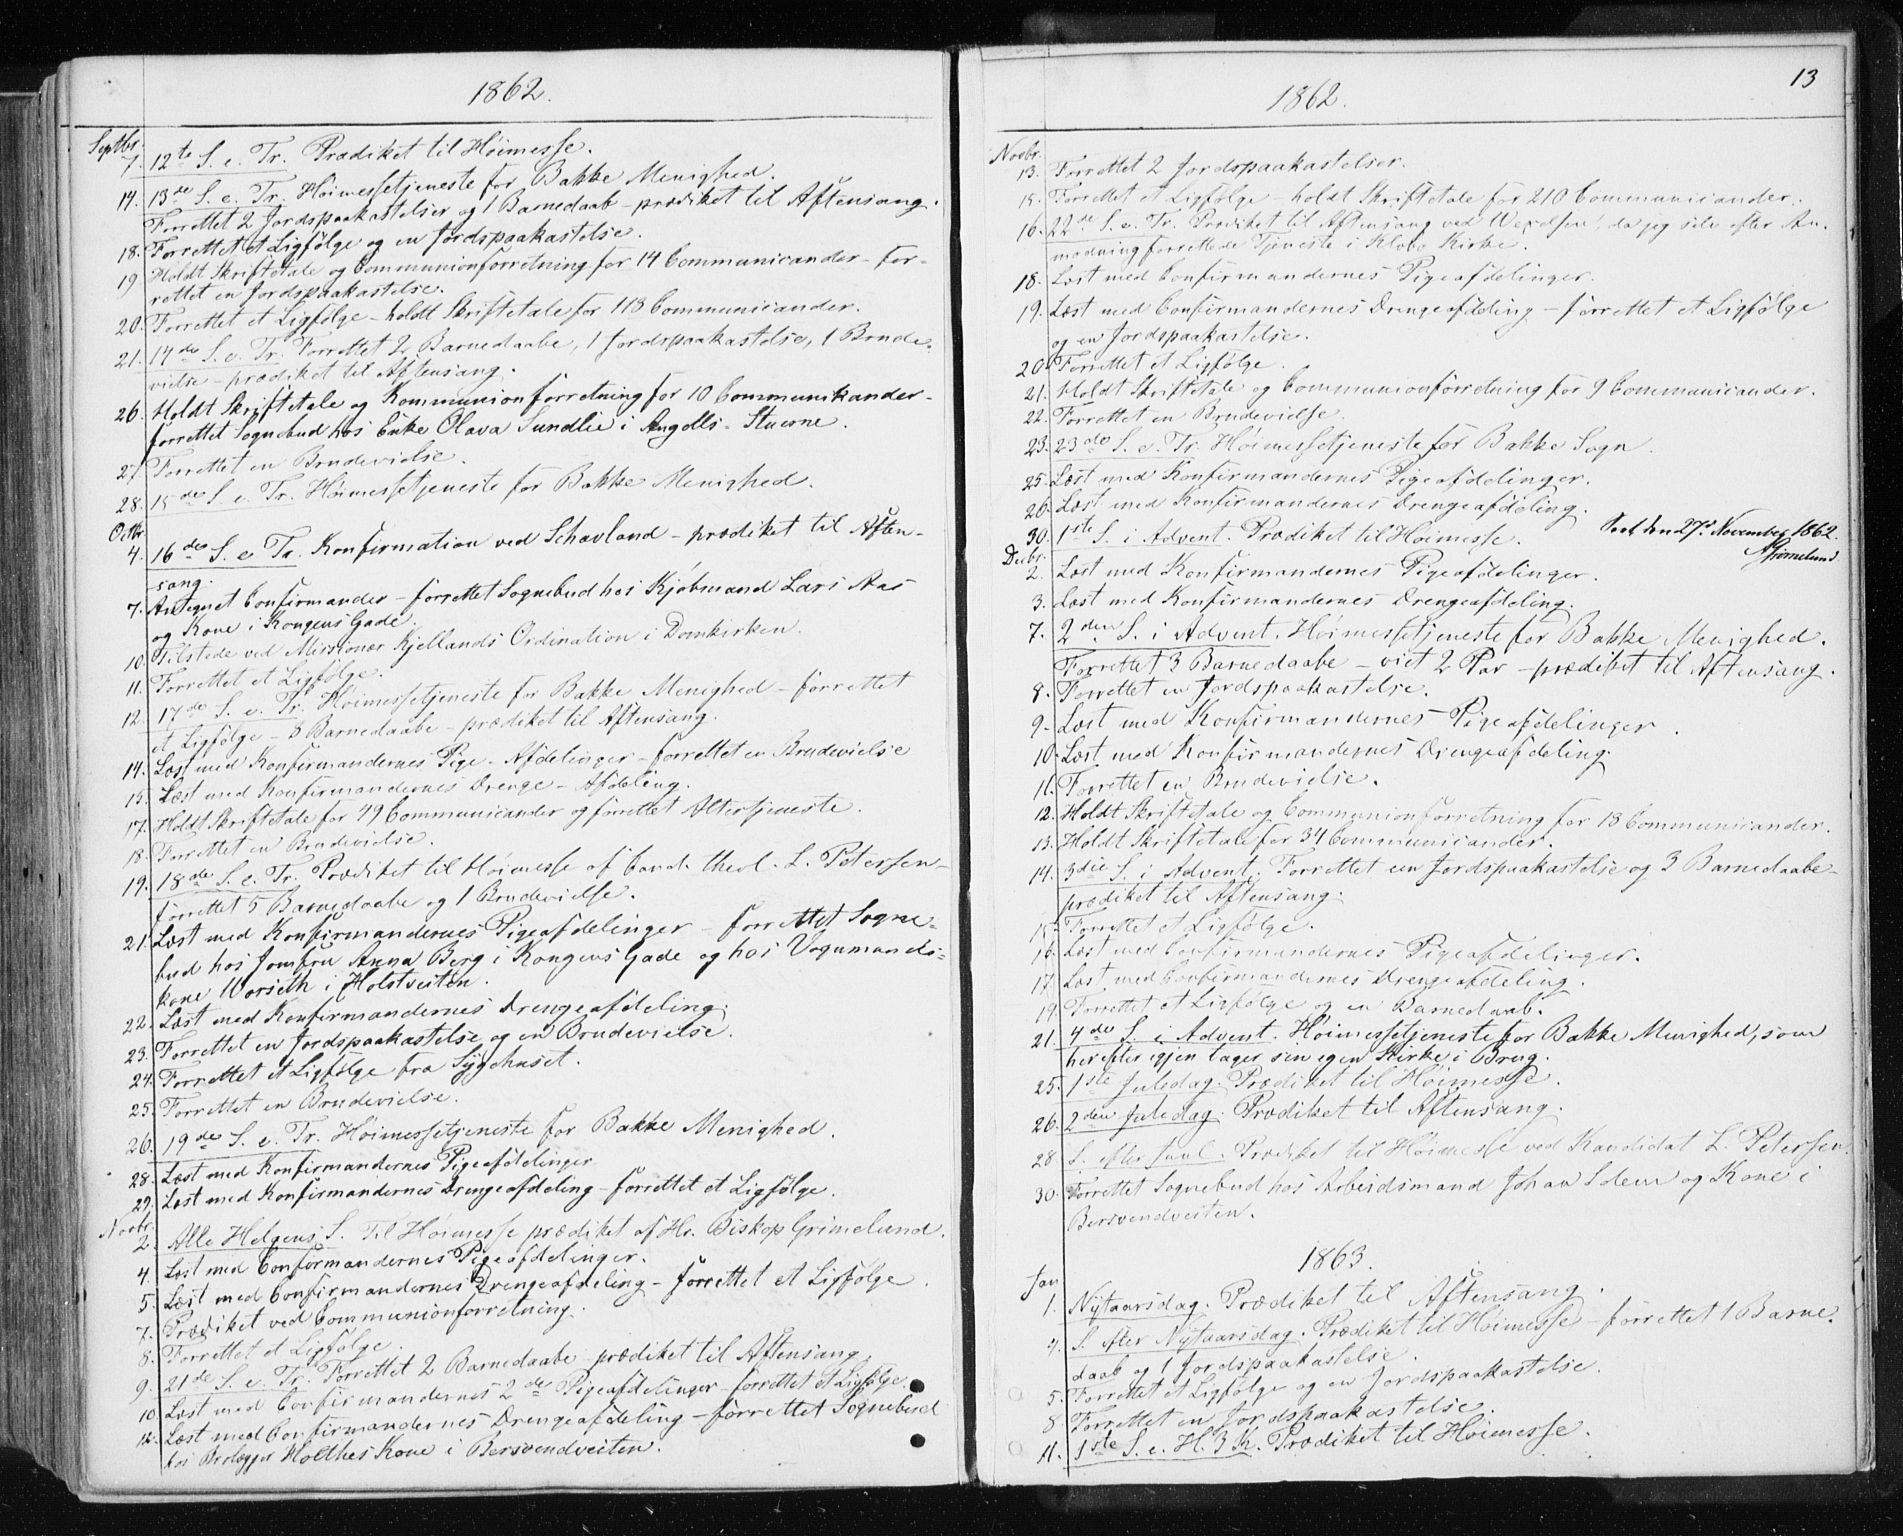 SAT, Ministerialprotokoller, klokkerbøker og fødselsregistre - Sør-Trøndelag, 601/L0053: Parish register (official) no. 601A21, 1857-1865, p. 13